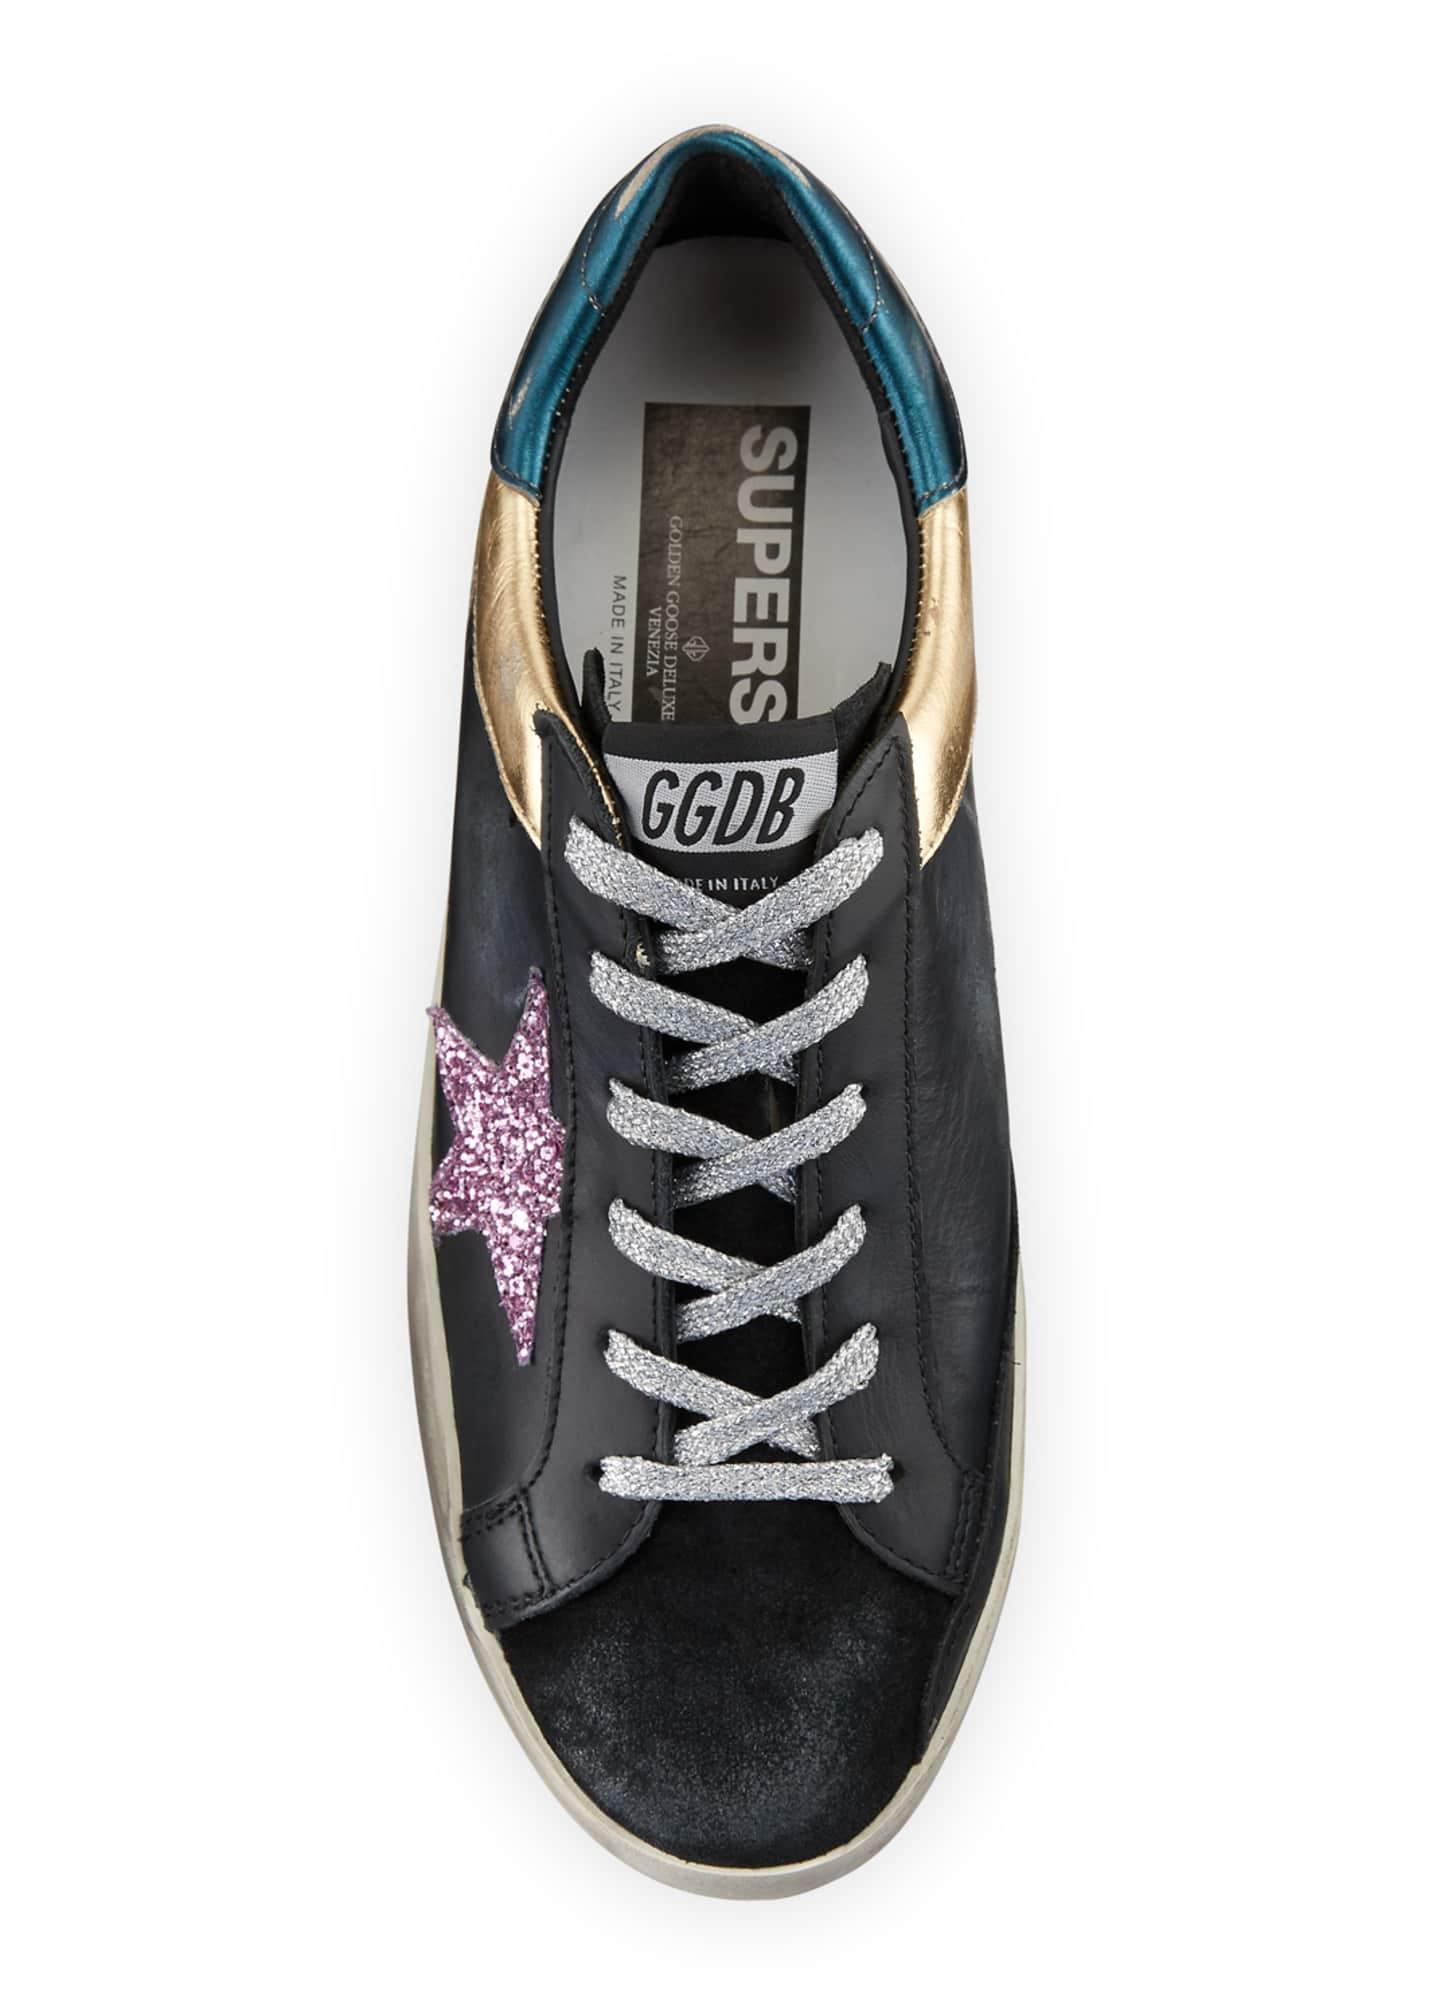 Goose Superstar Multi Metallic Sneakers